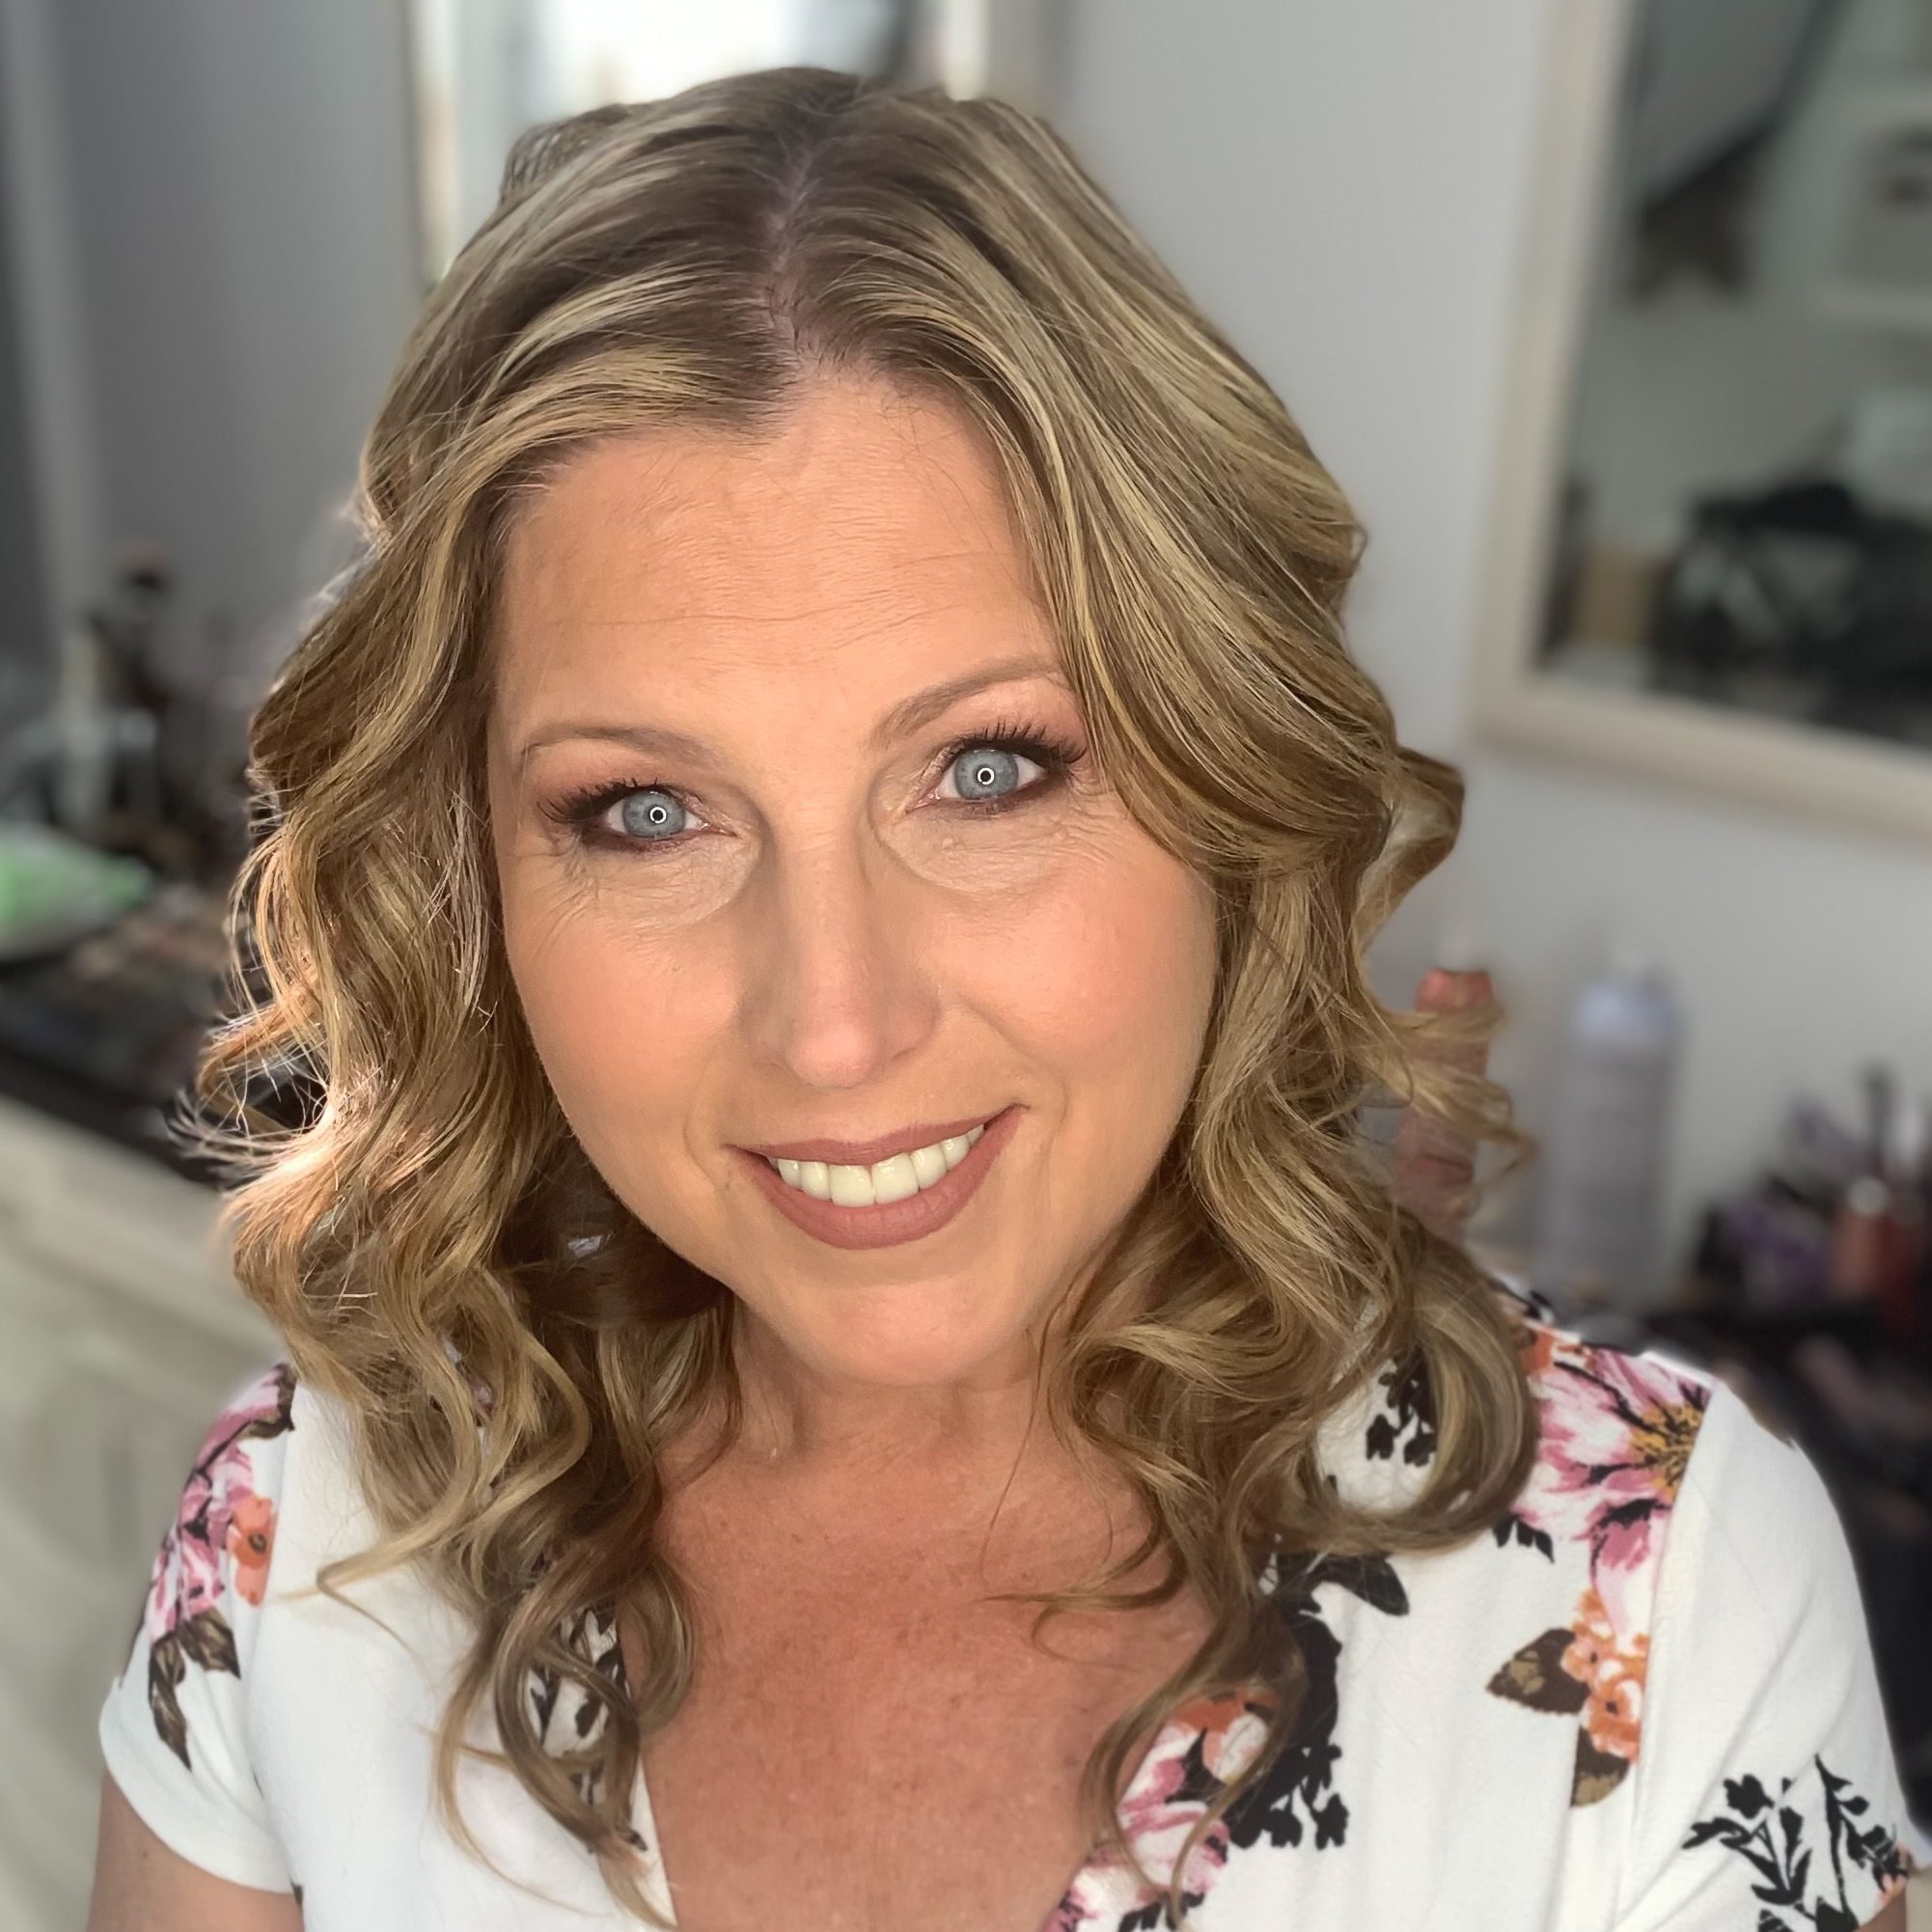 faces-by-april-wedding-makeup-fortlauderdale-9